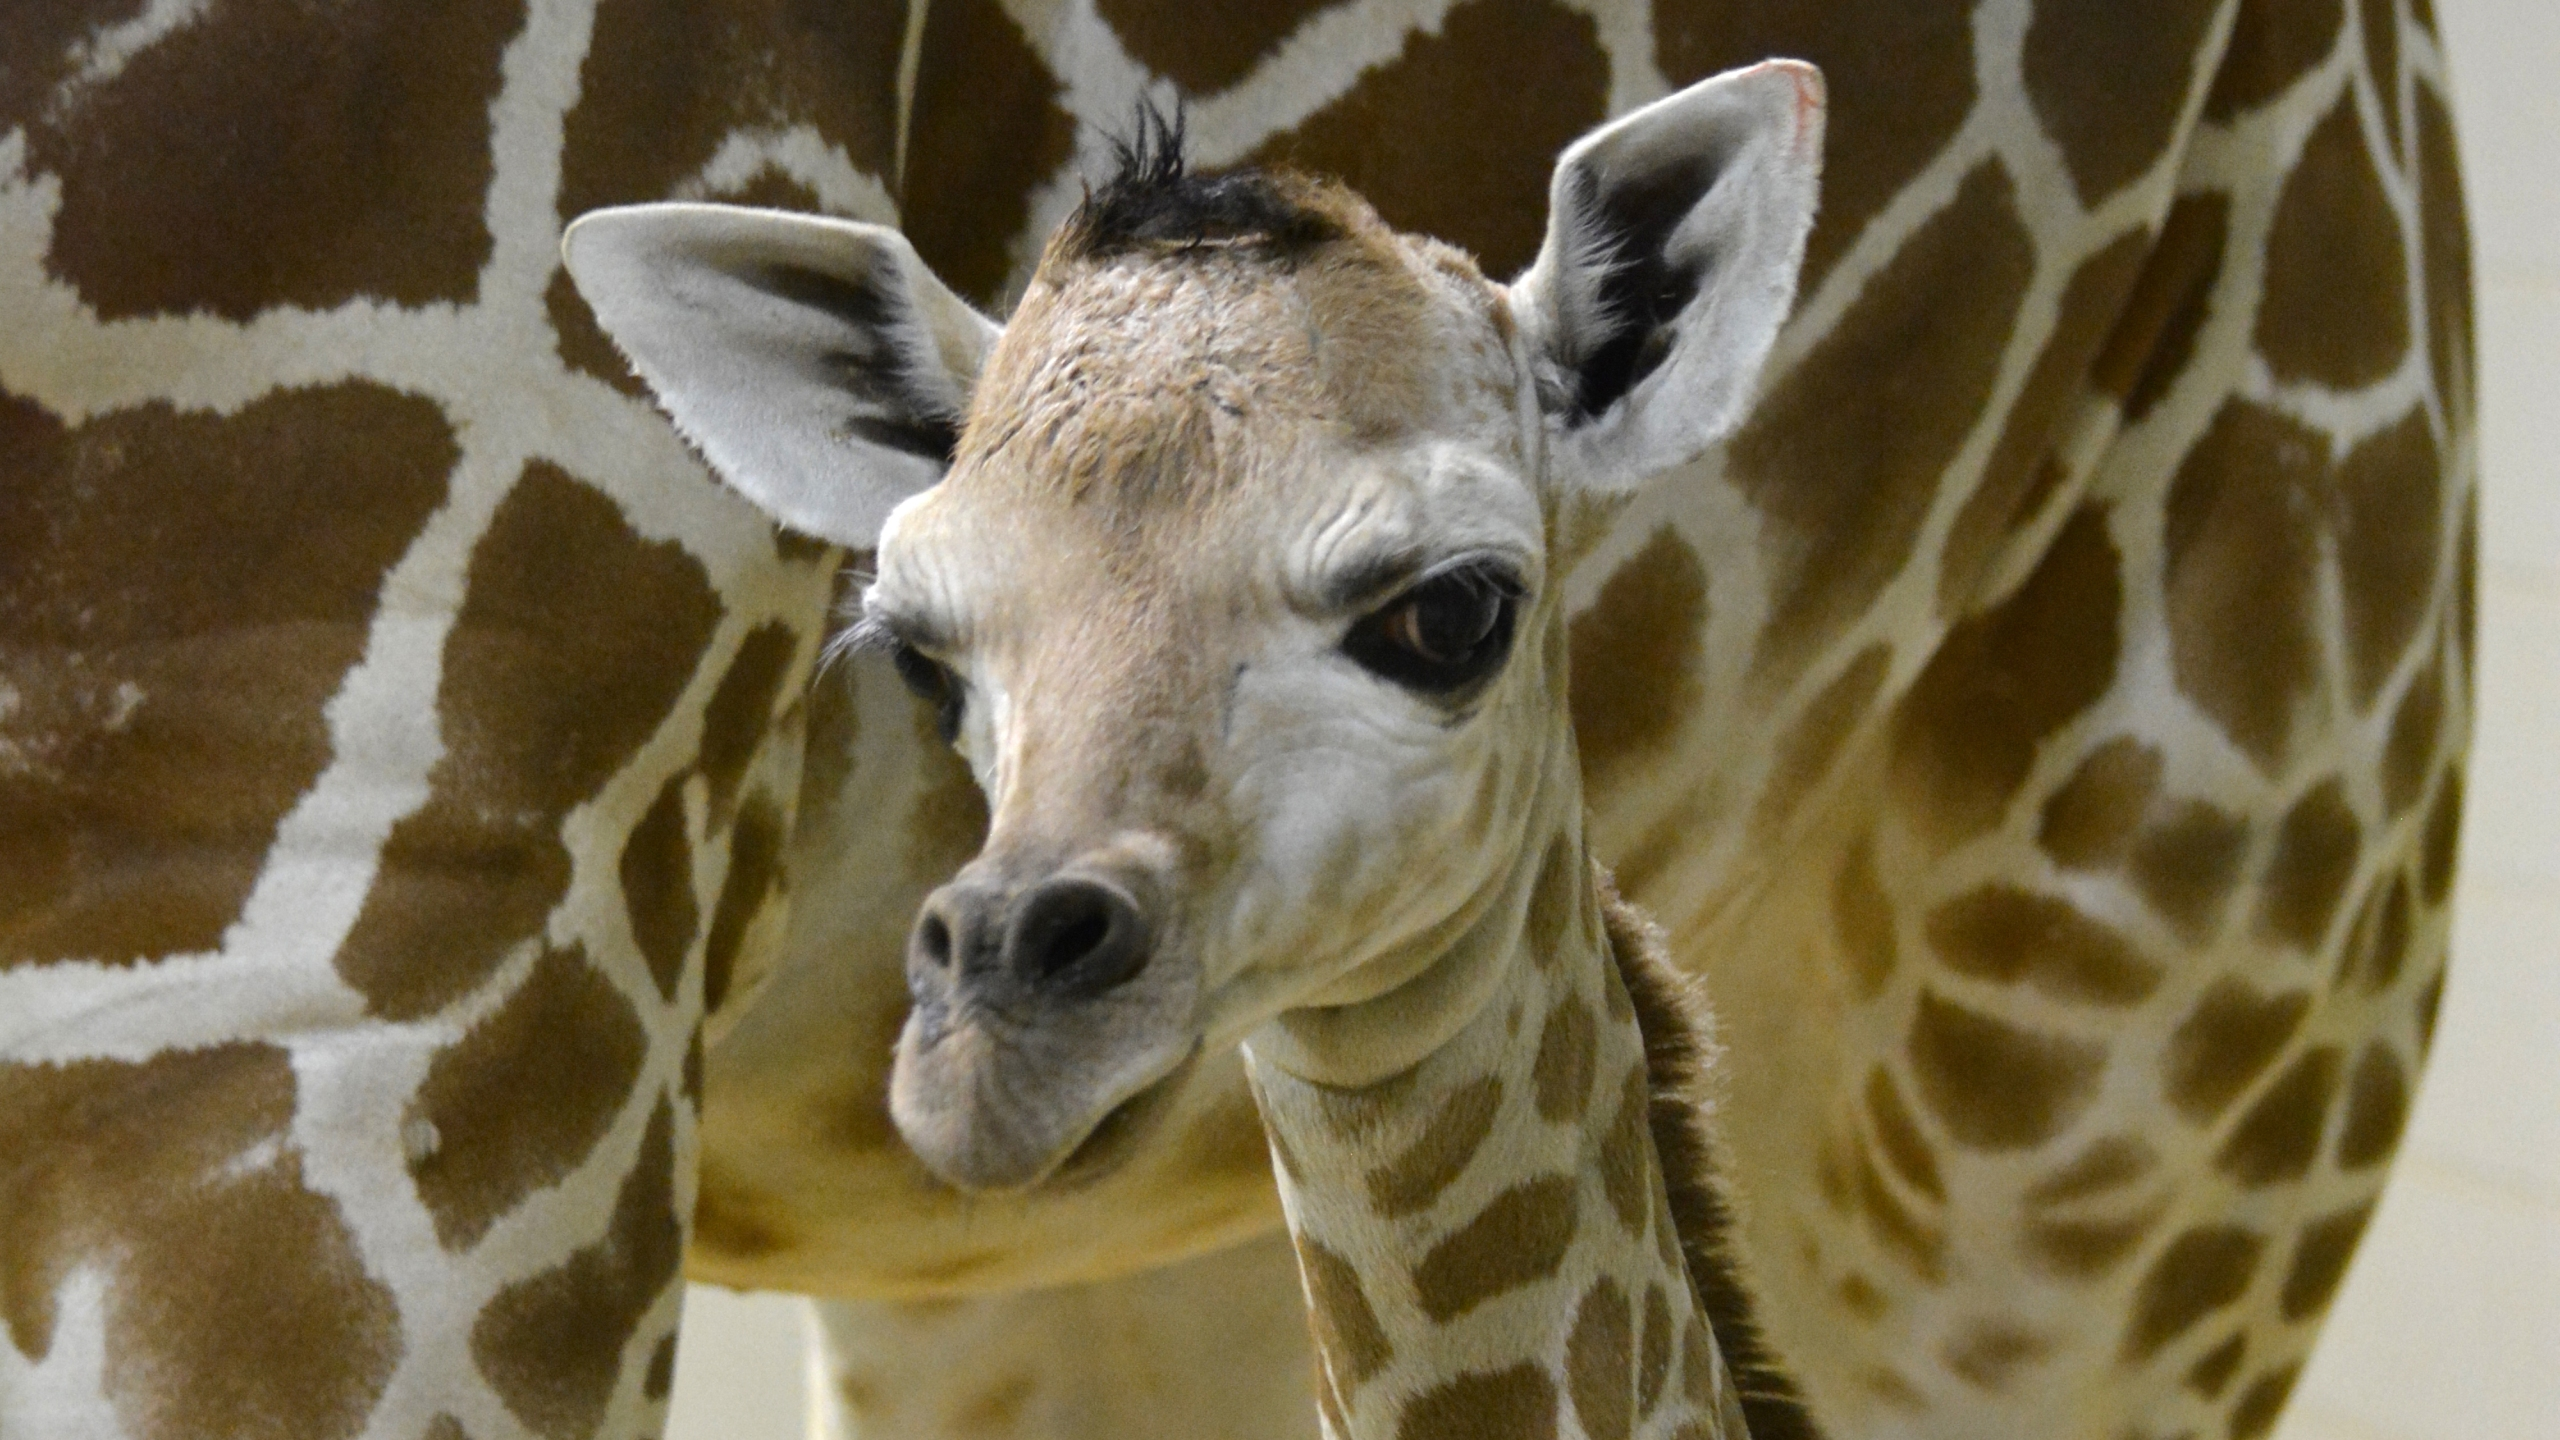 The Cheyenne Mountain Zoo welcomed its 200th giraffe calf Monday. Photo courtesy Cheyenne Mountain Zoo